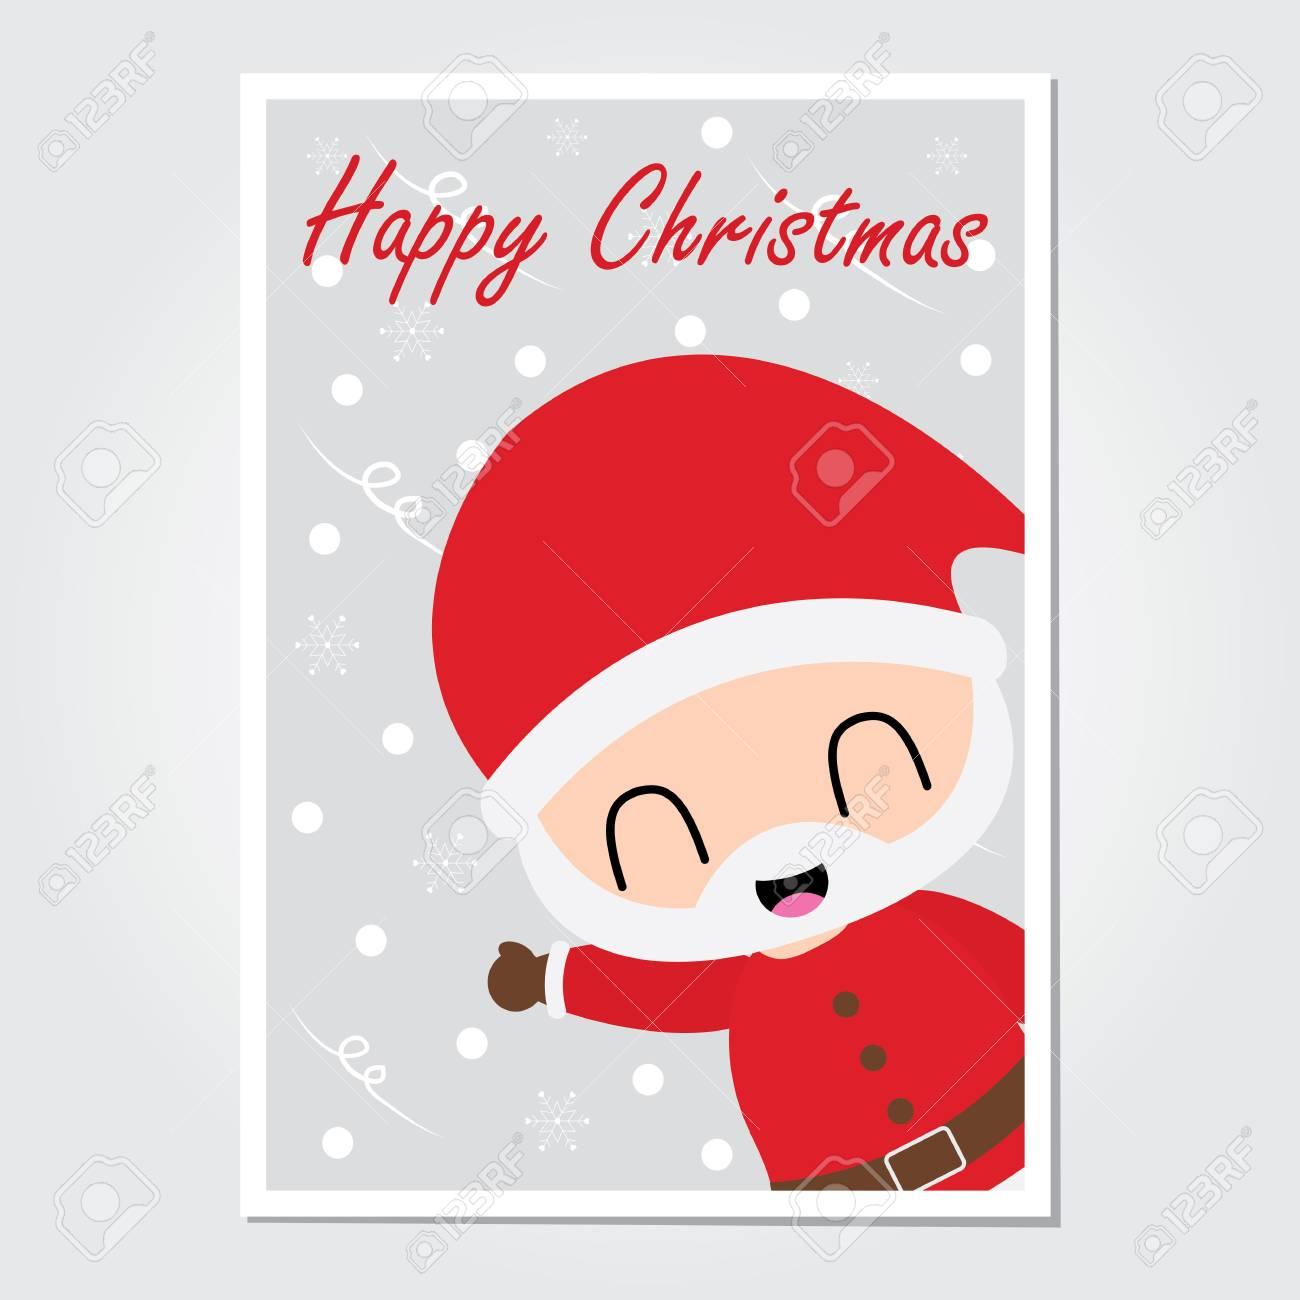 Cute Santa Claus Say Hello Vector Cartoon Illustration For Christmas Card Design Wallpaper And Greeting